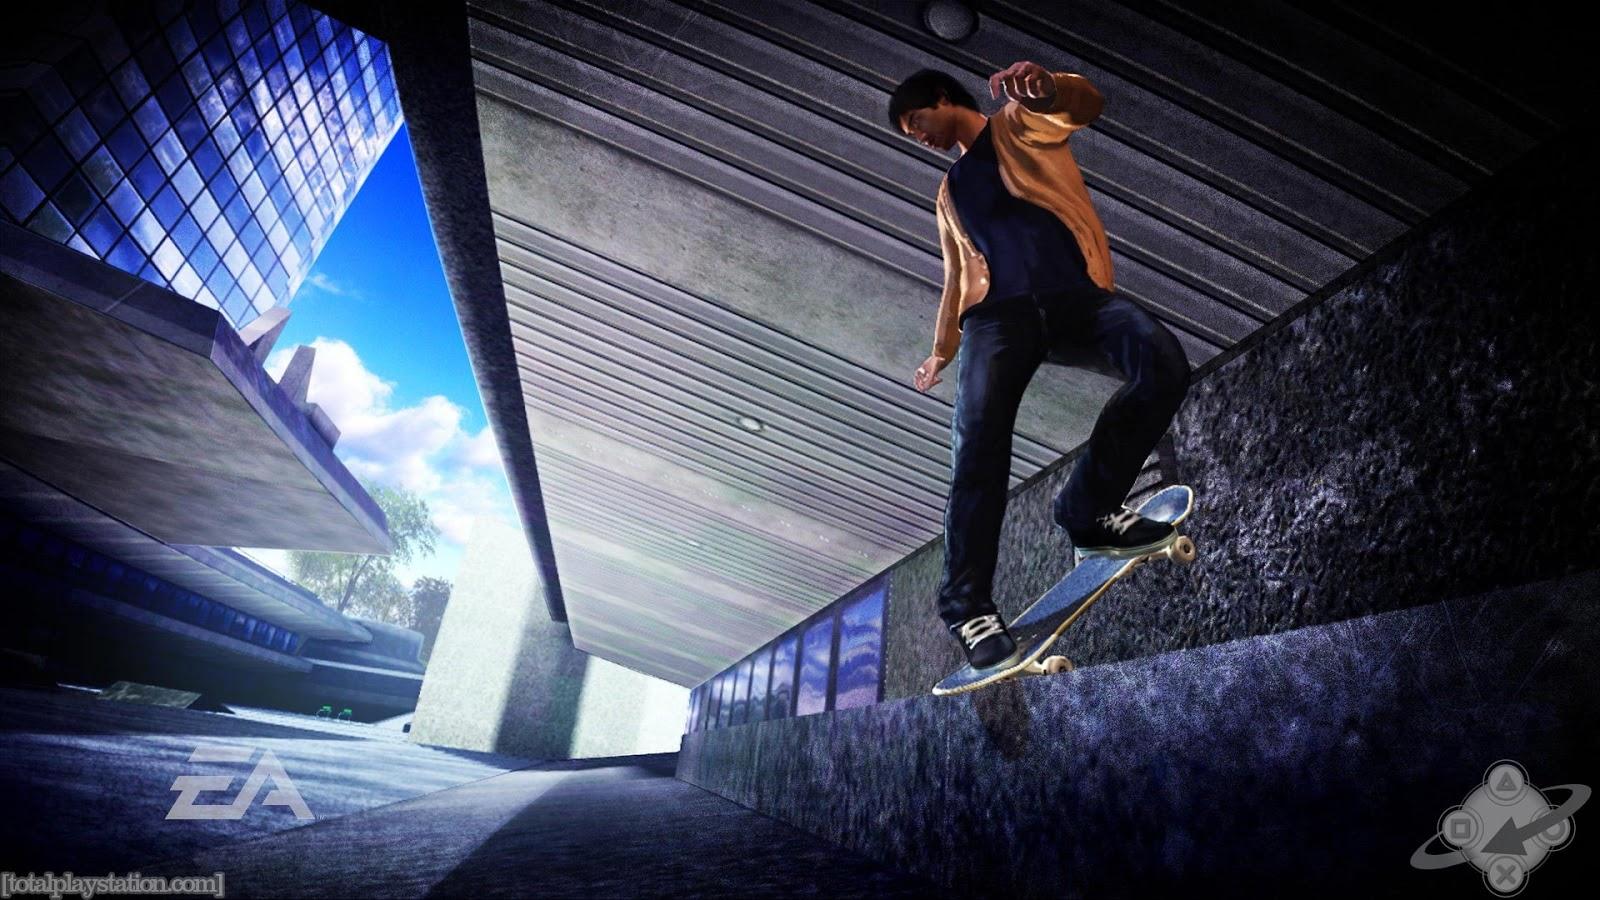 76] Skateboard Wallpaper on WallpaperSafari 1600x900